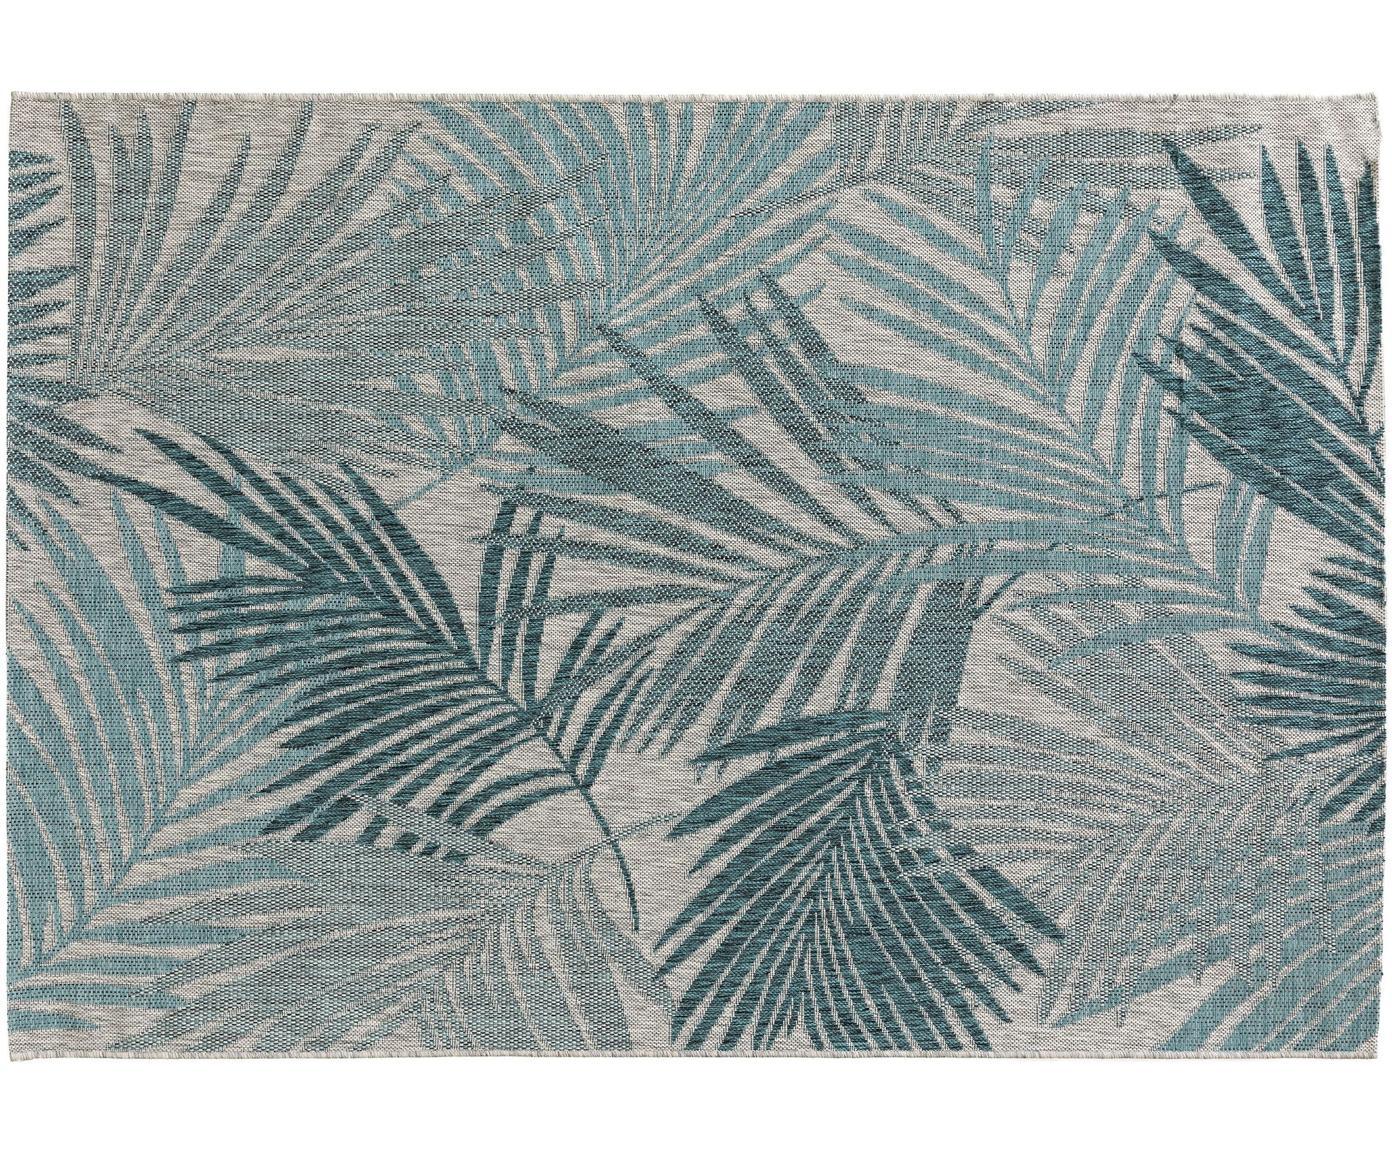 Alfombra de interior/exterior Cleo, 90%polipropileno, 10%poliéster, Azul, An 300 x L 400 cm (Tamaño XL)